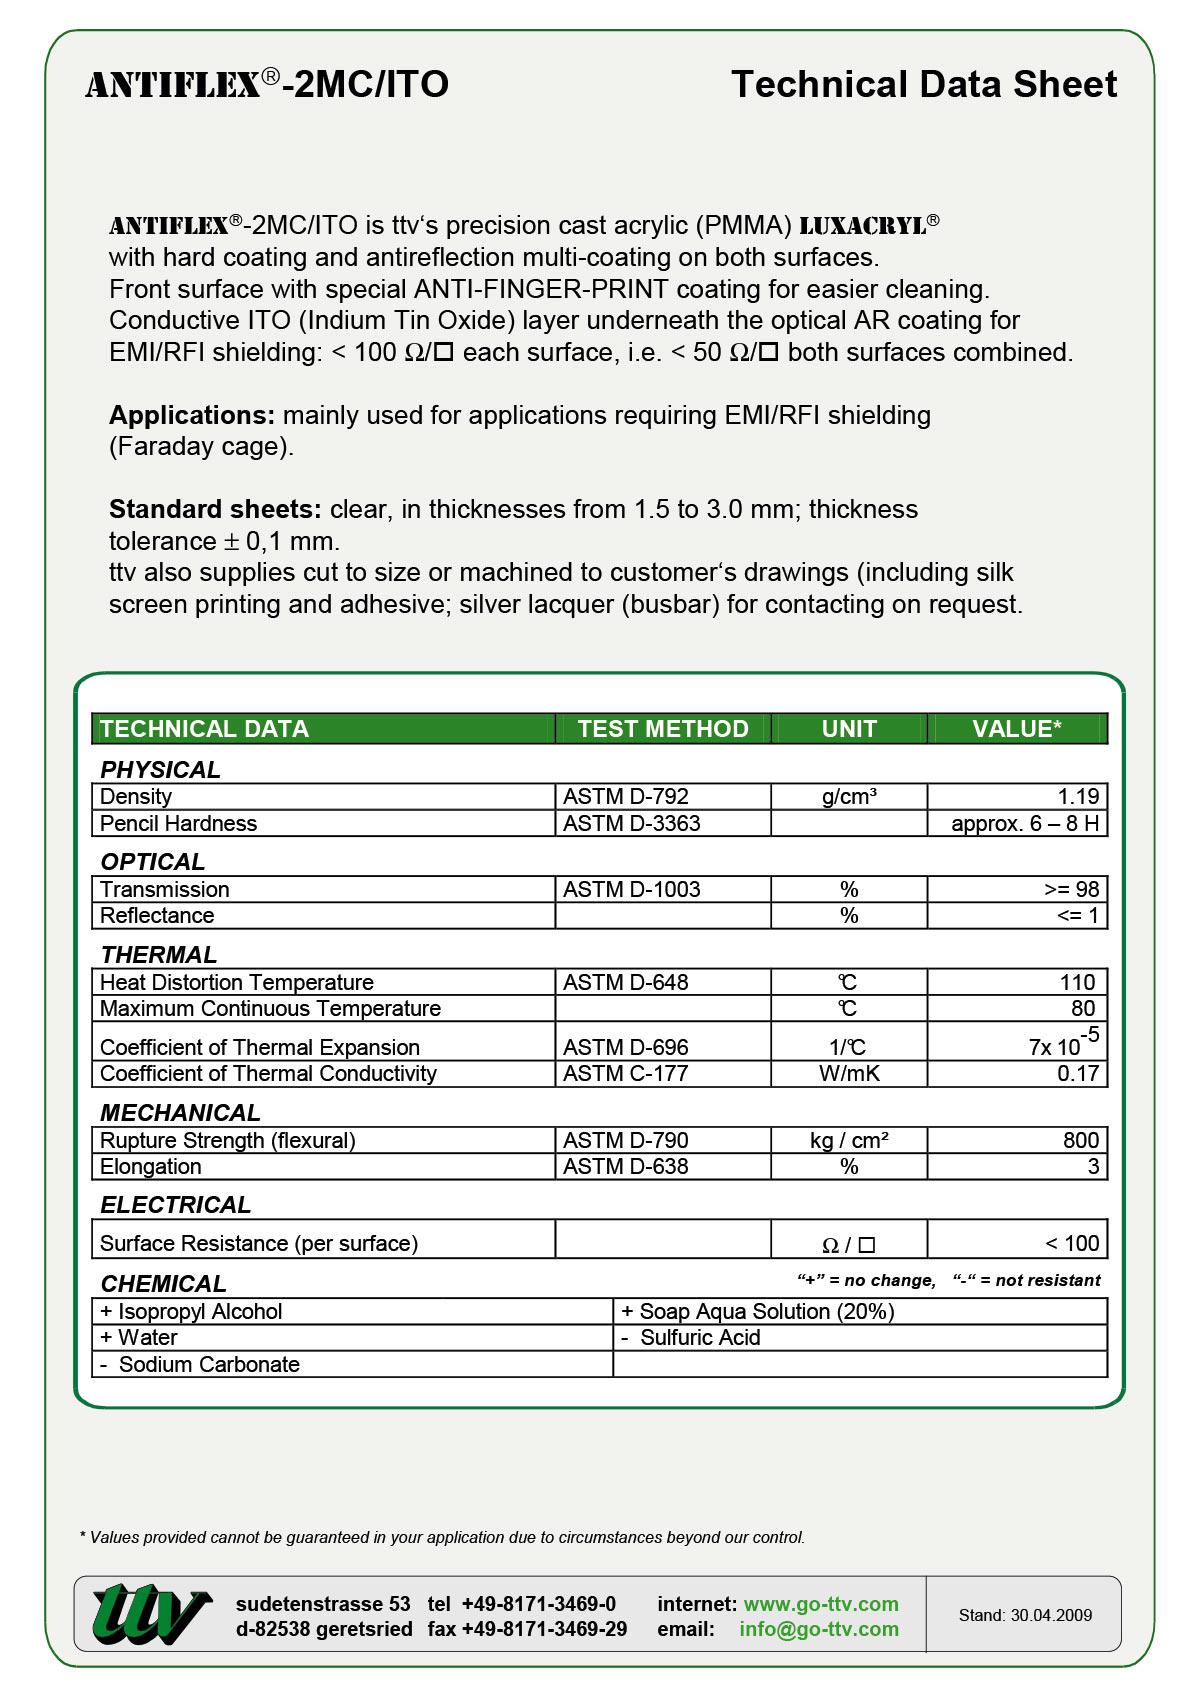 ANTIFLEX-2MC-ITO Data sheet